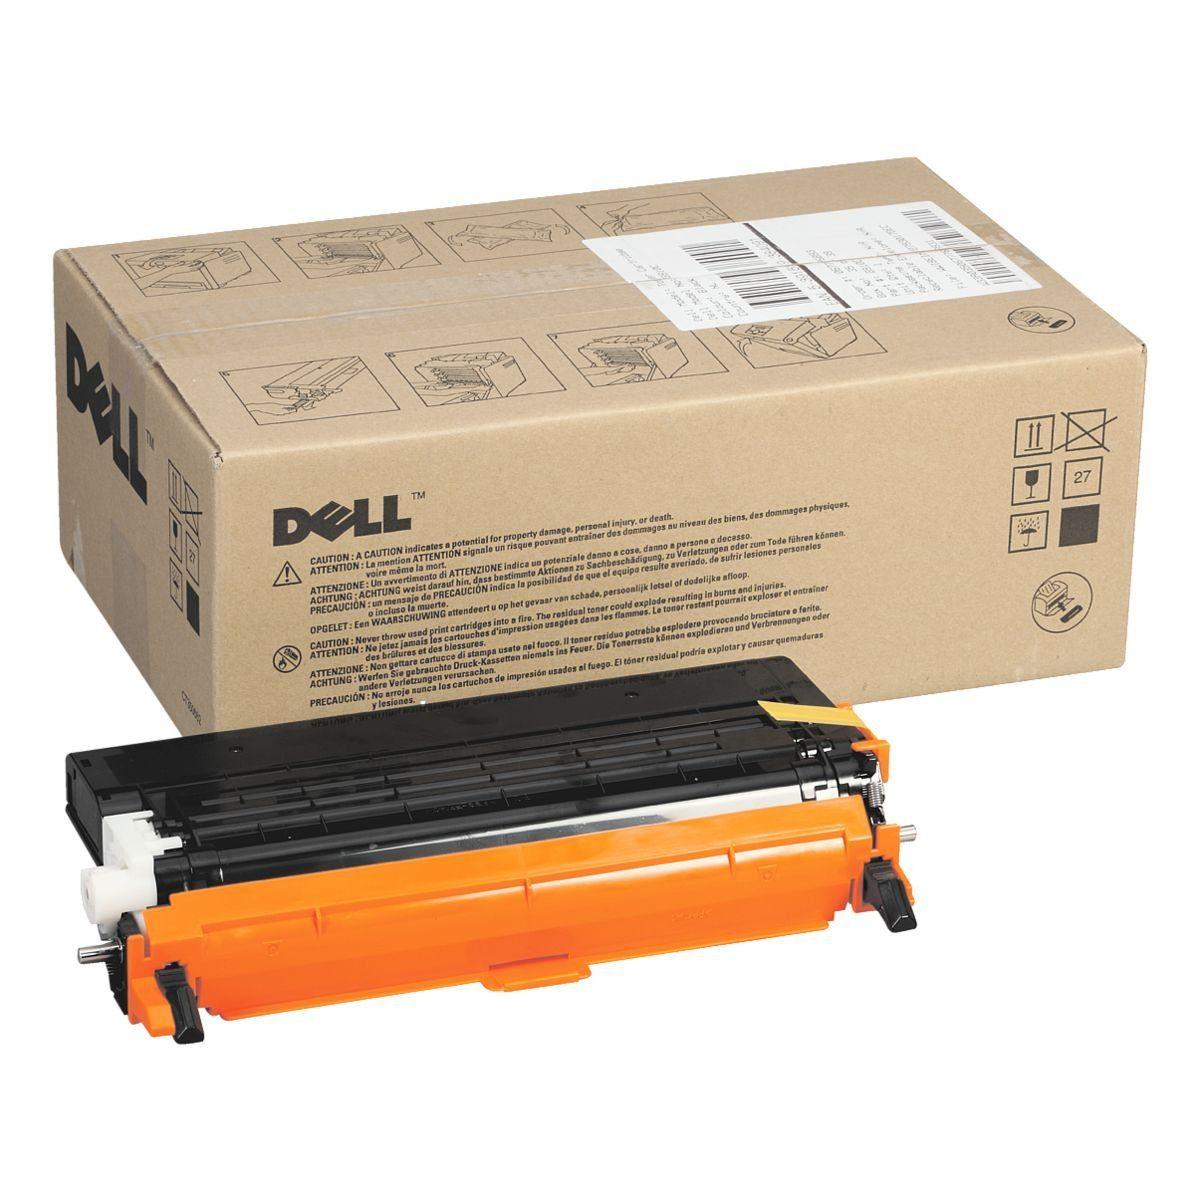 Dell EMC Tonerkartusche »593-10293«